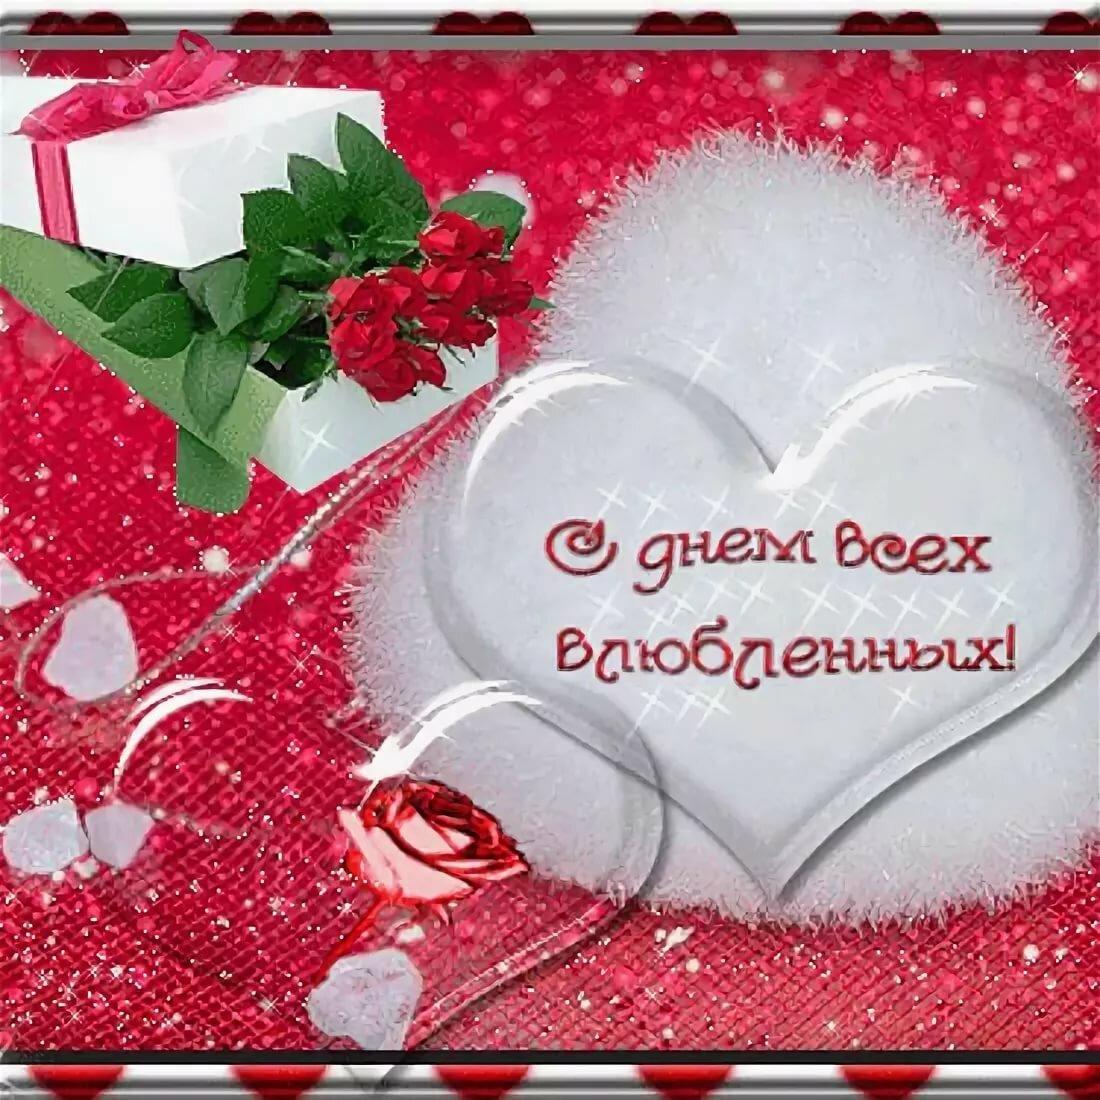 Валентинка другу открытки